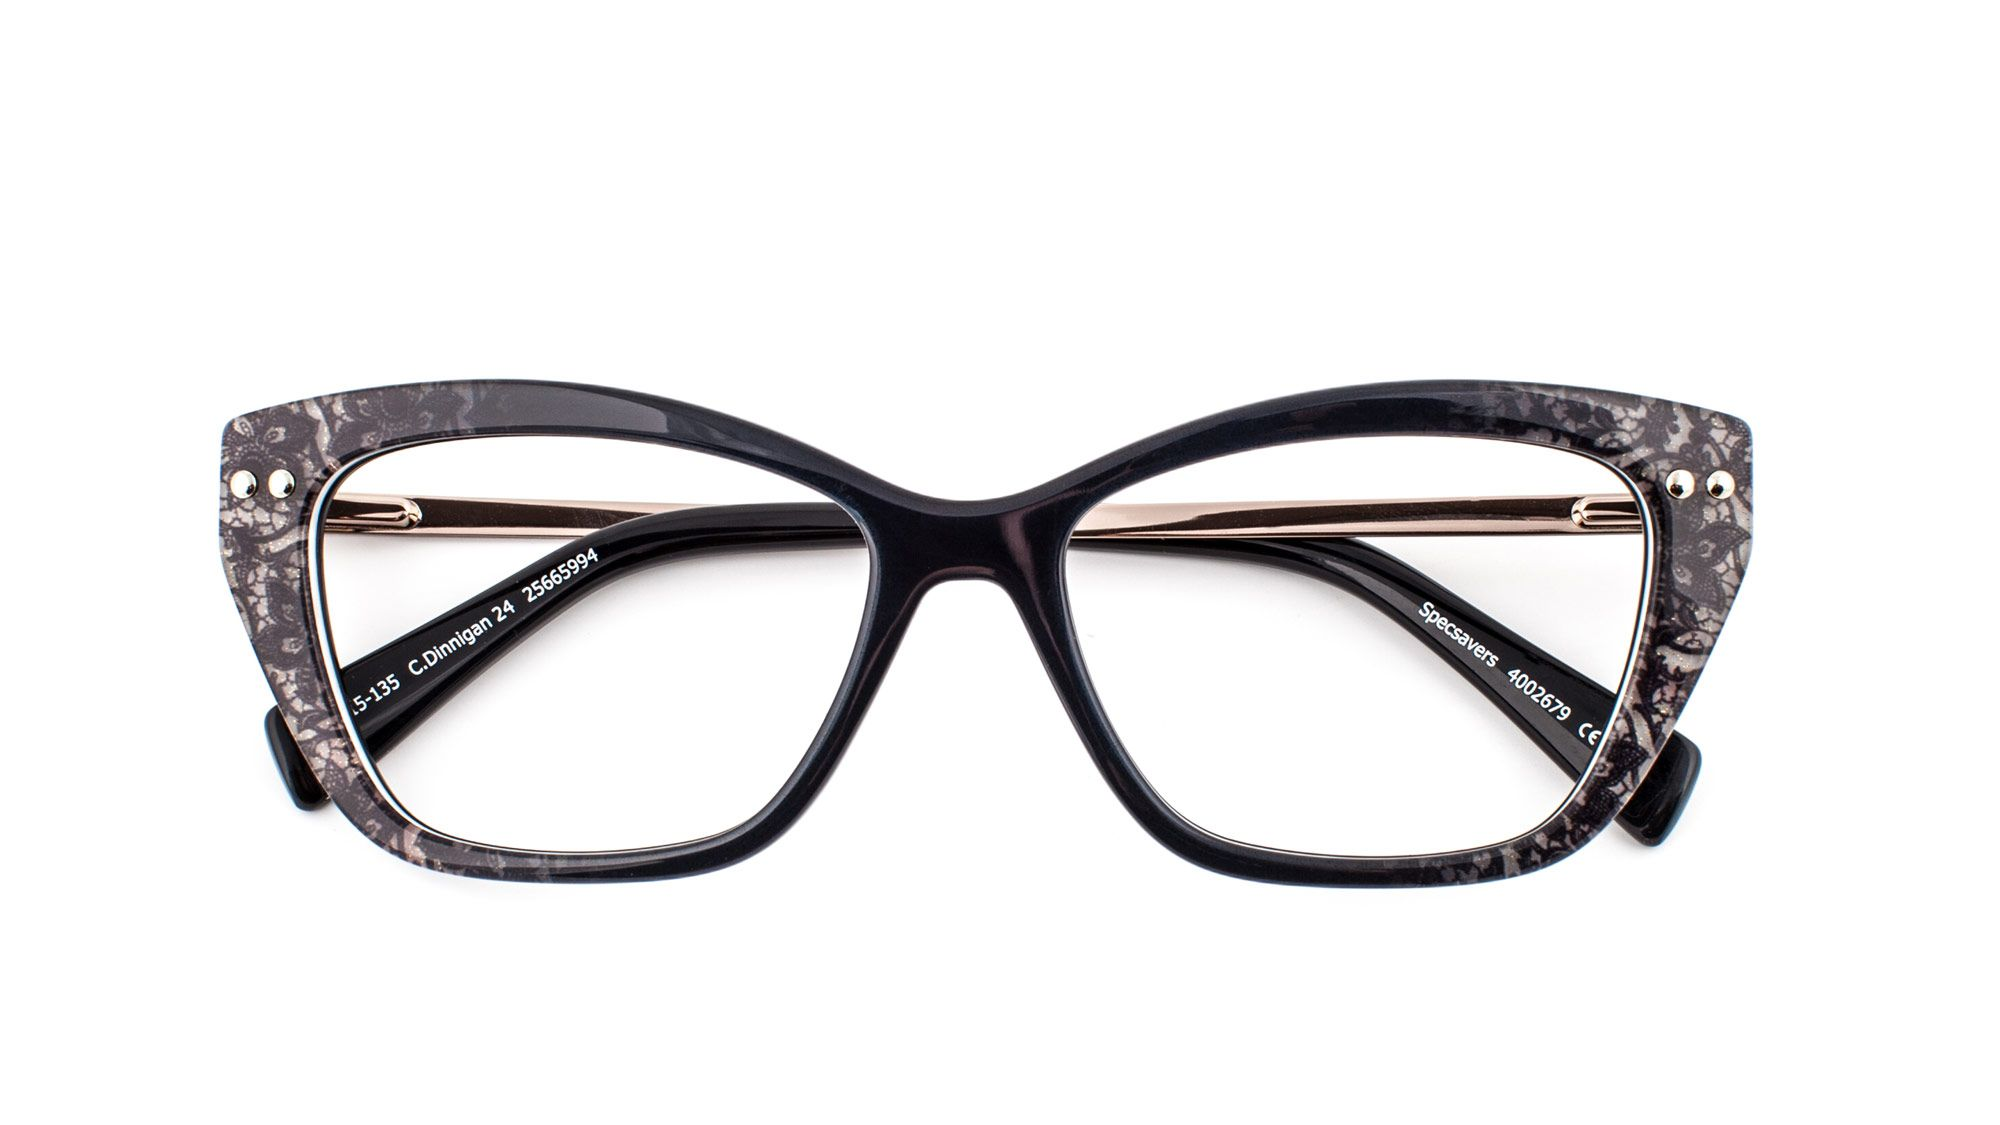 Specsavers GlassesSunglassesContact Designer Optometrists Designer Specsavers Specsavers Optometrists Optometrists GlassesSunglassesContact v0w8nmN